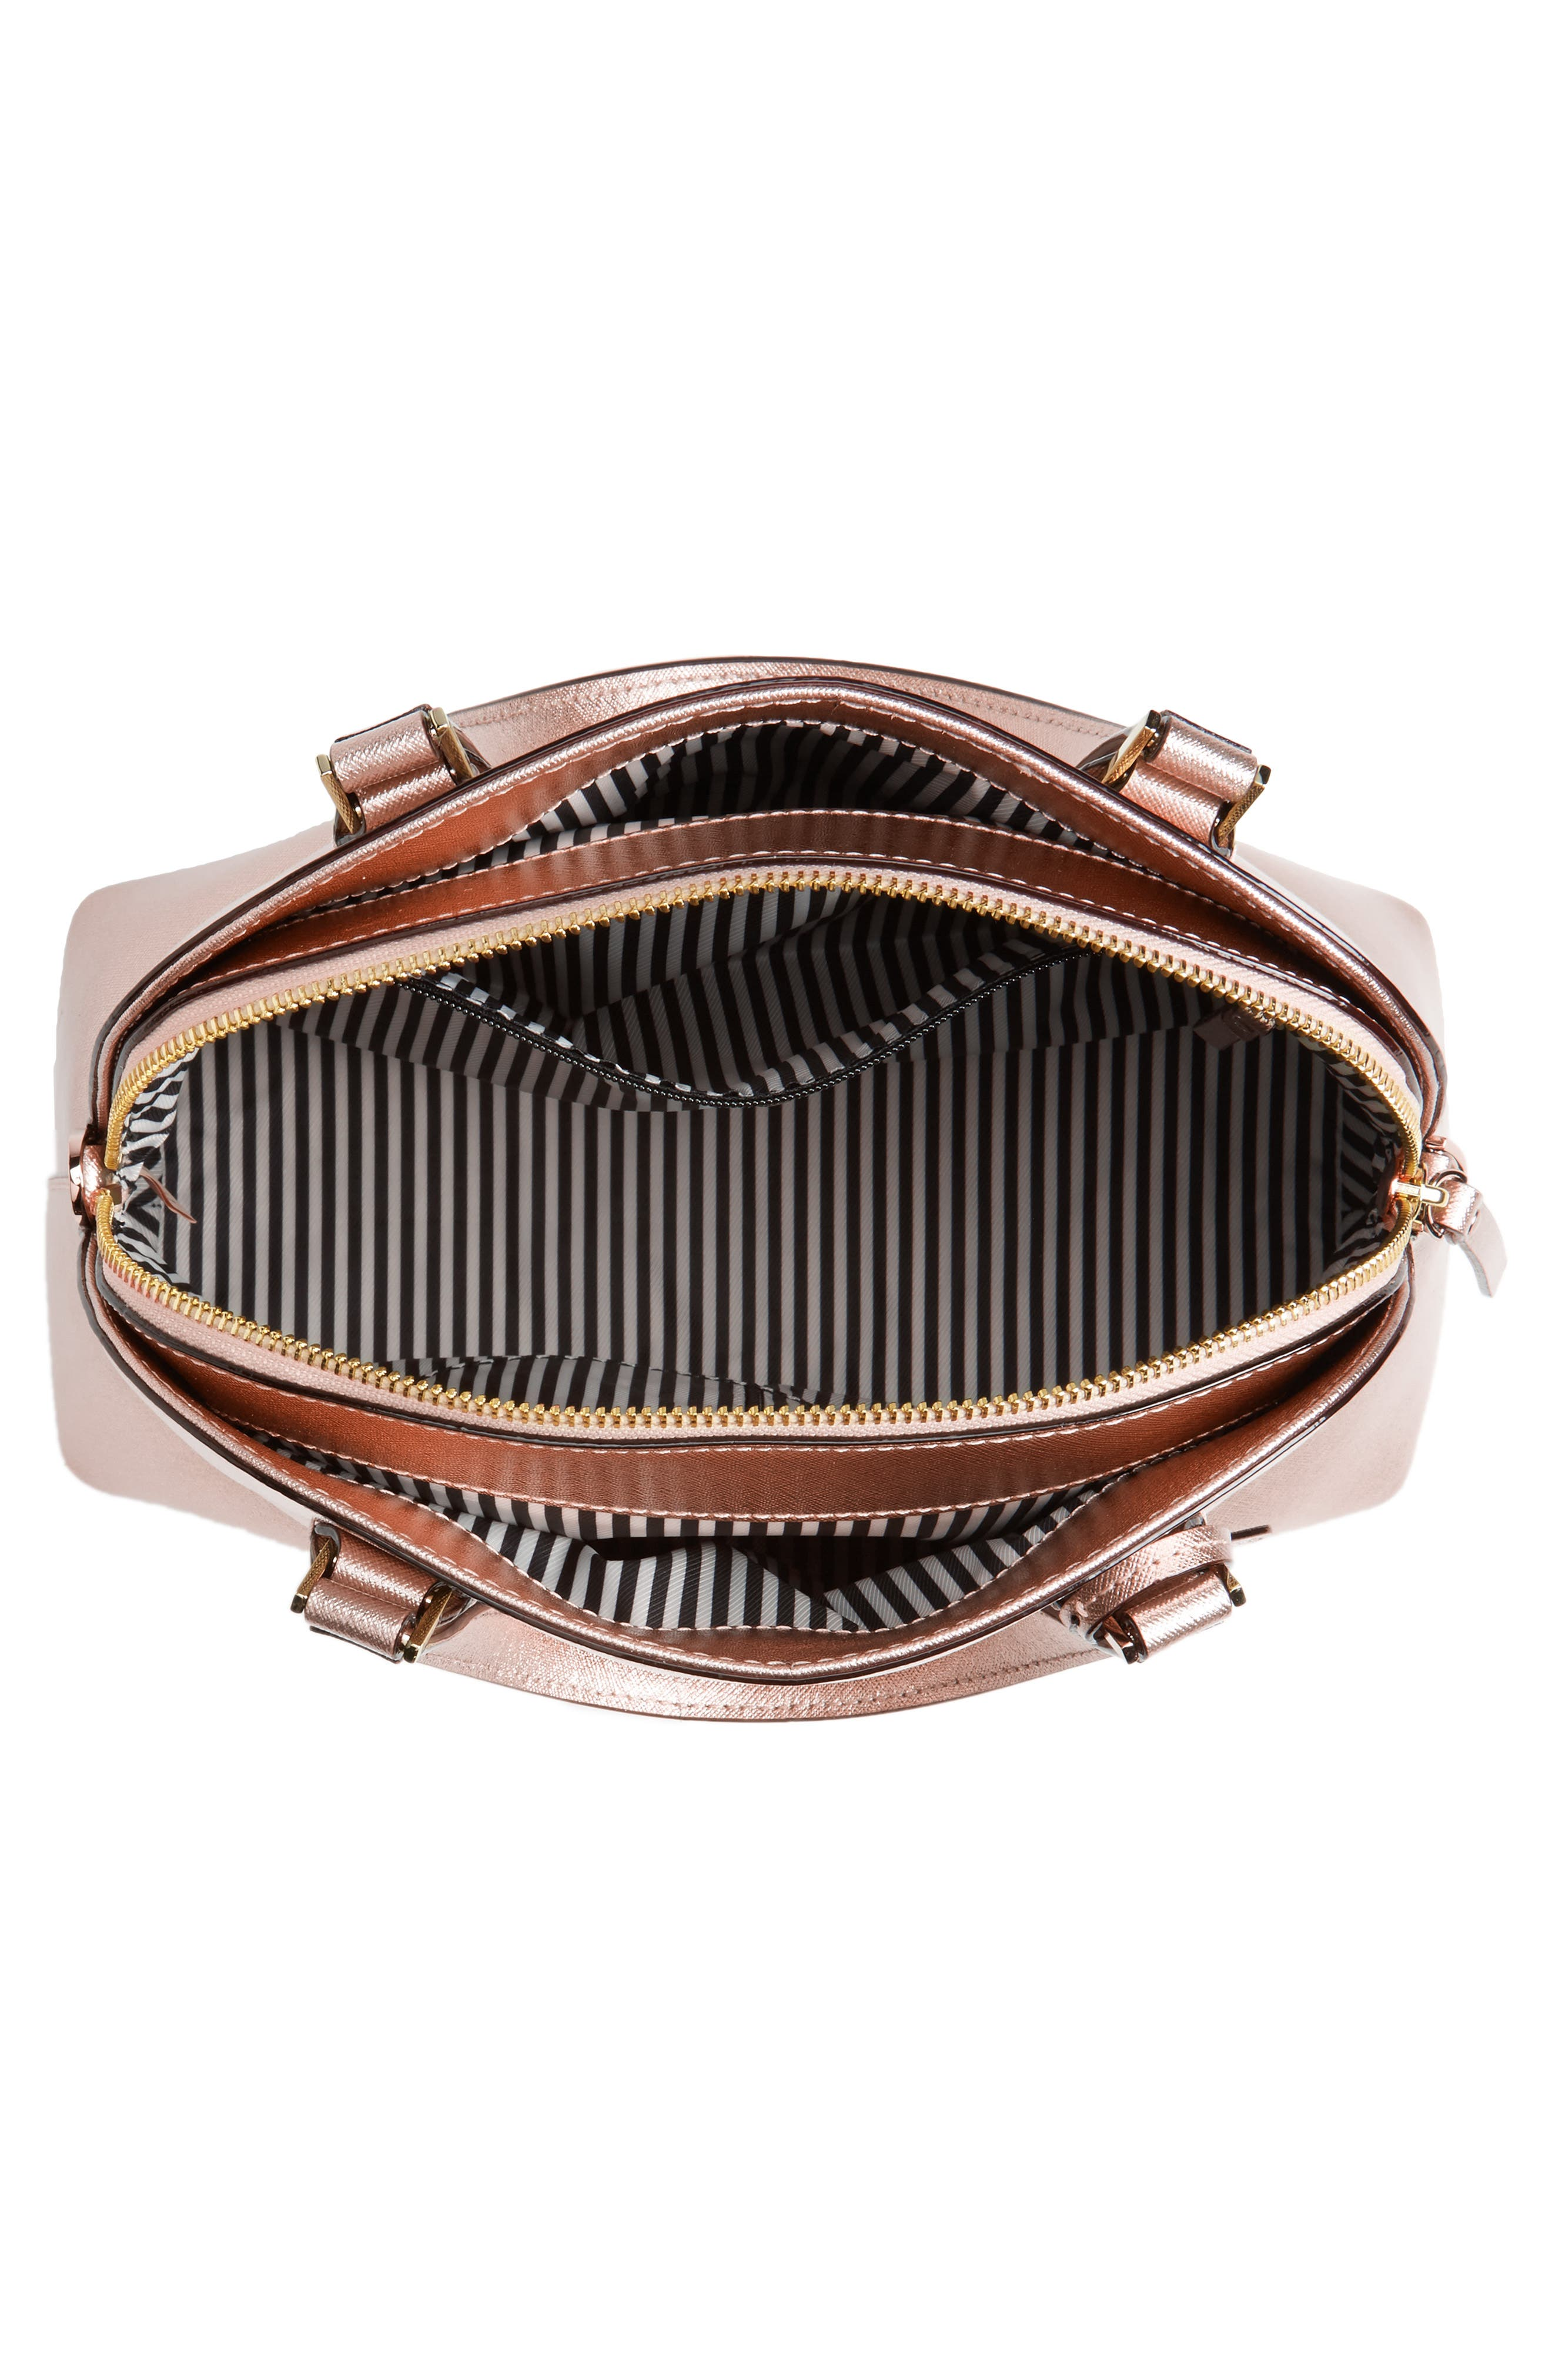 cameron street - lottie leather satchel,                             Alternate thumbnail 4, color,                             650